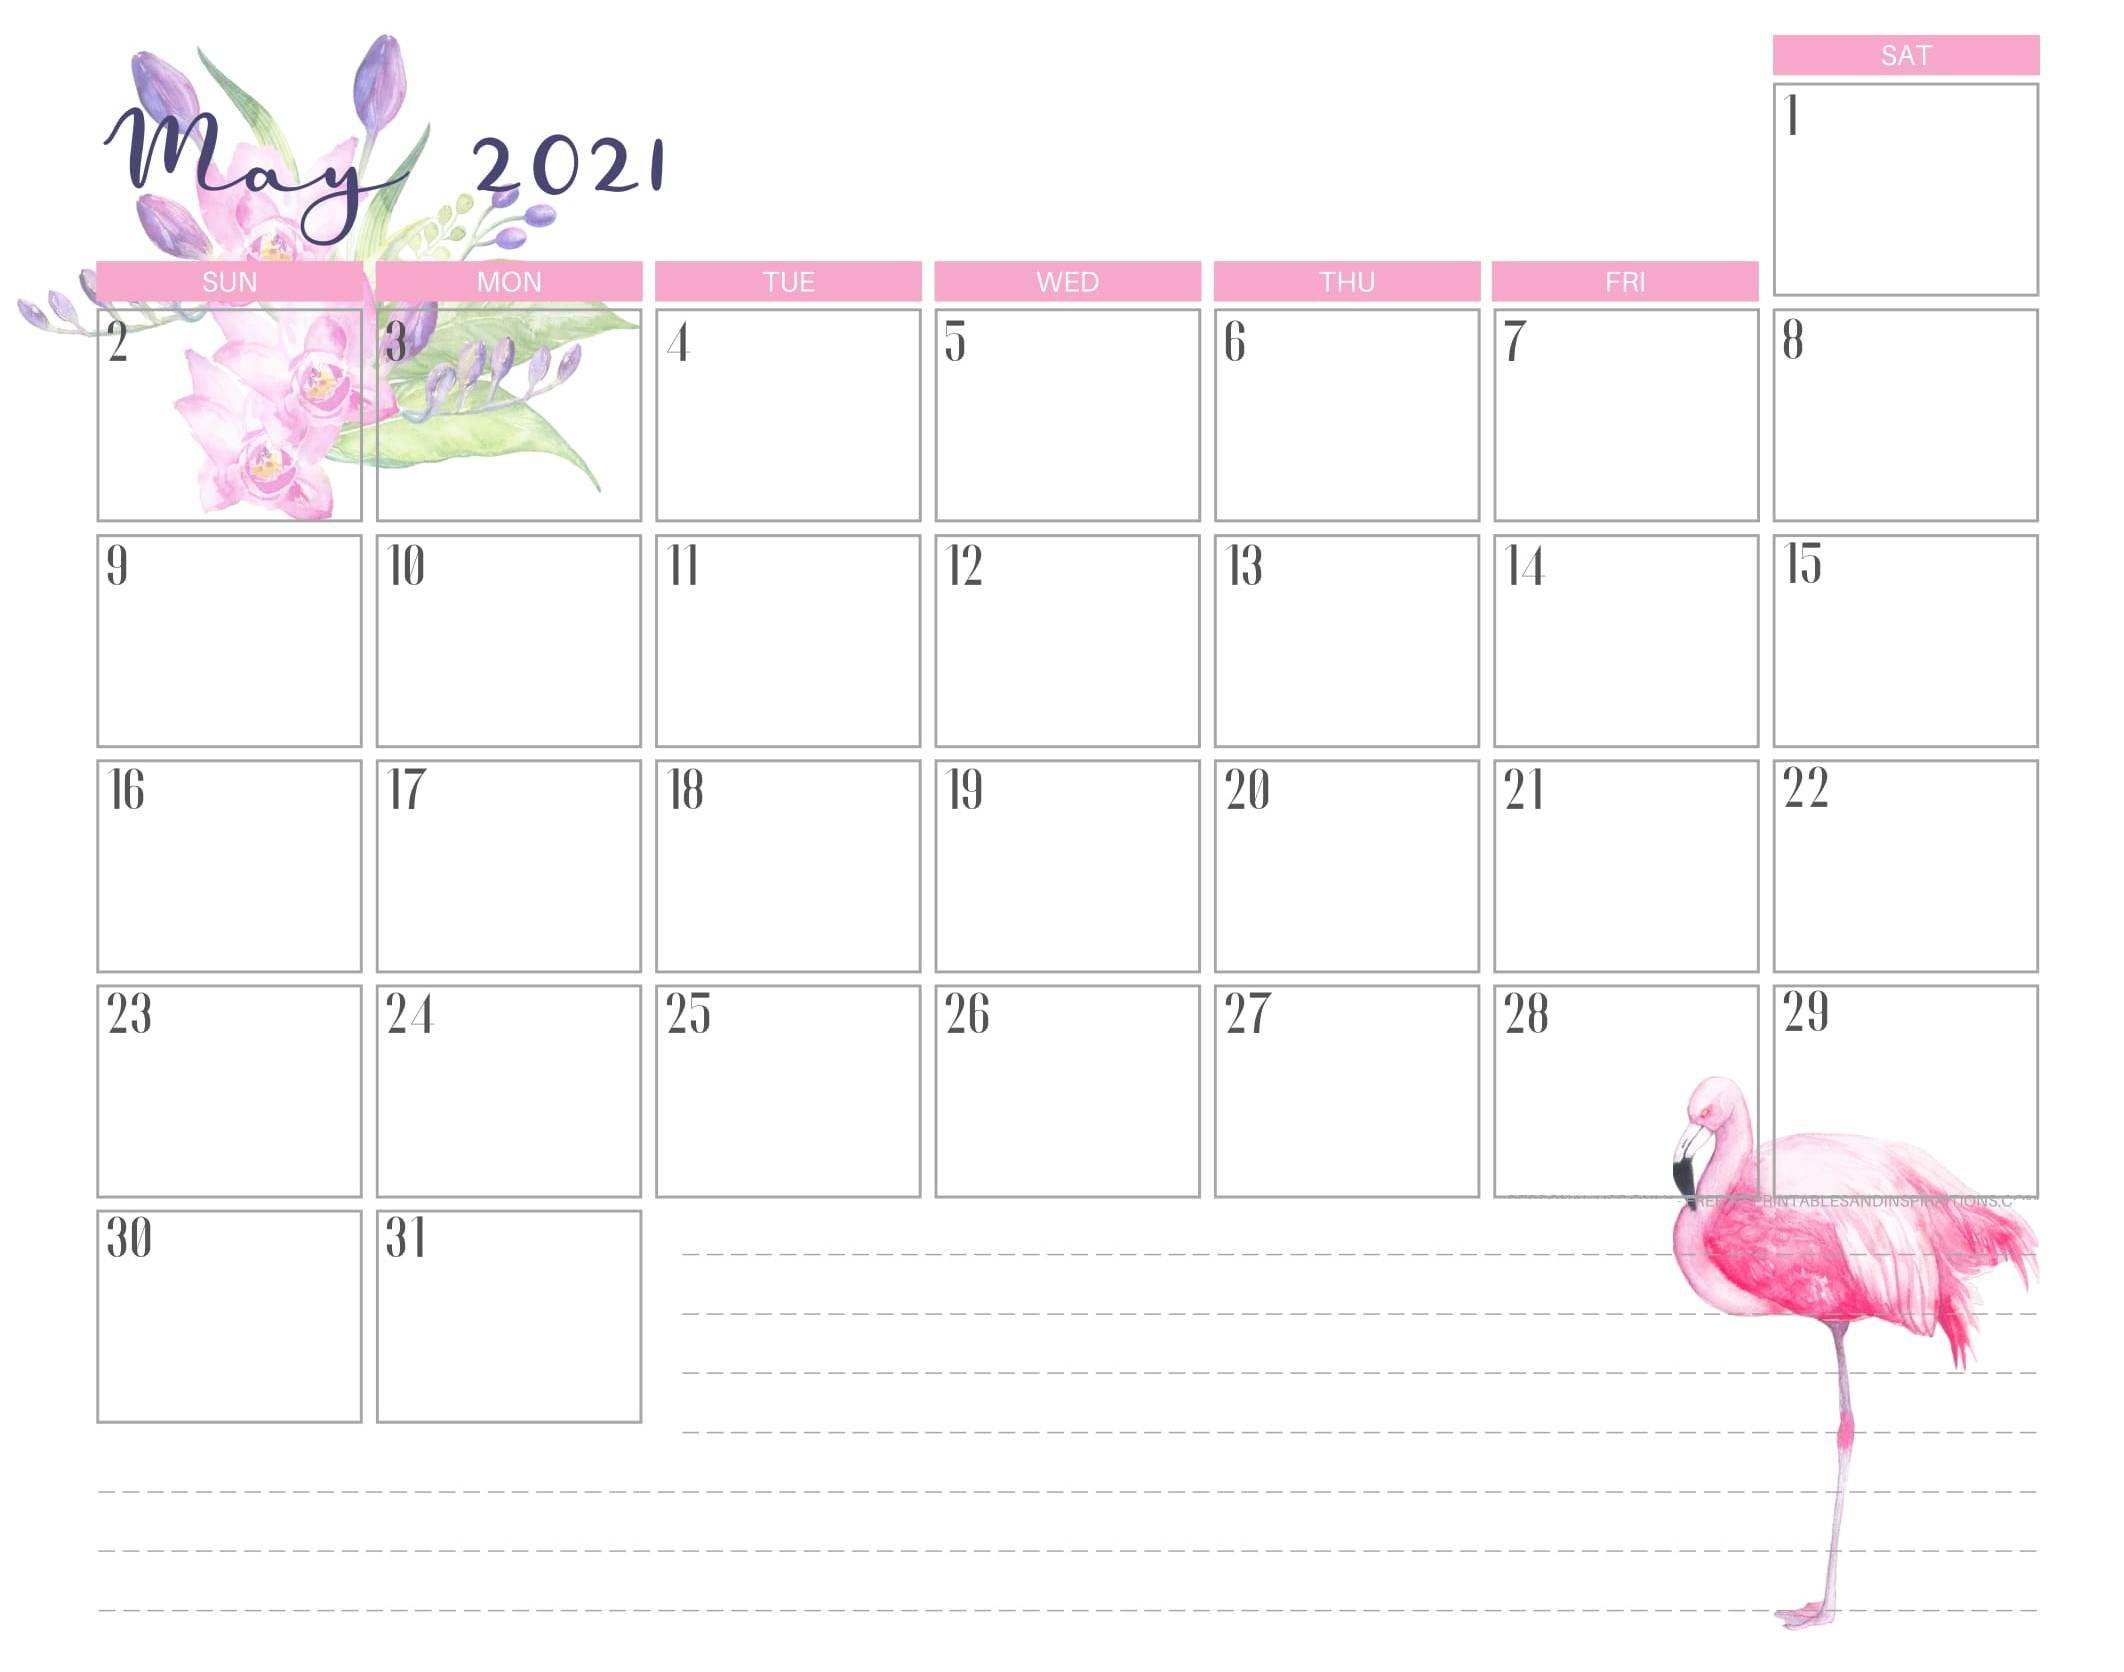 Printable May 2021 Calendar Uk Blank Holidays - My Blog